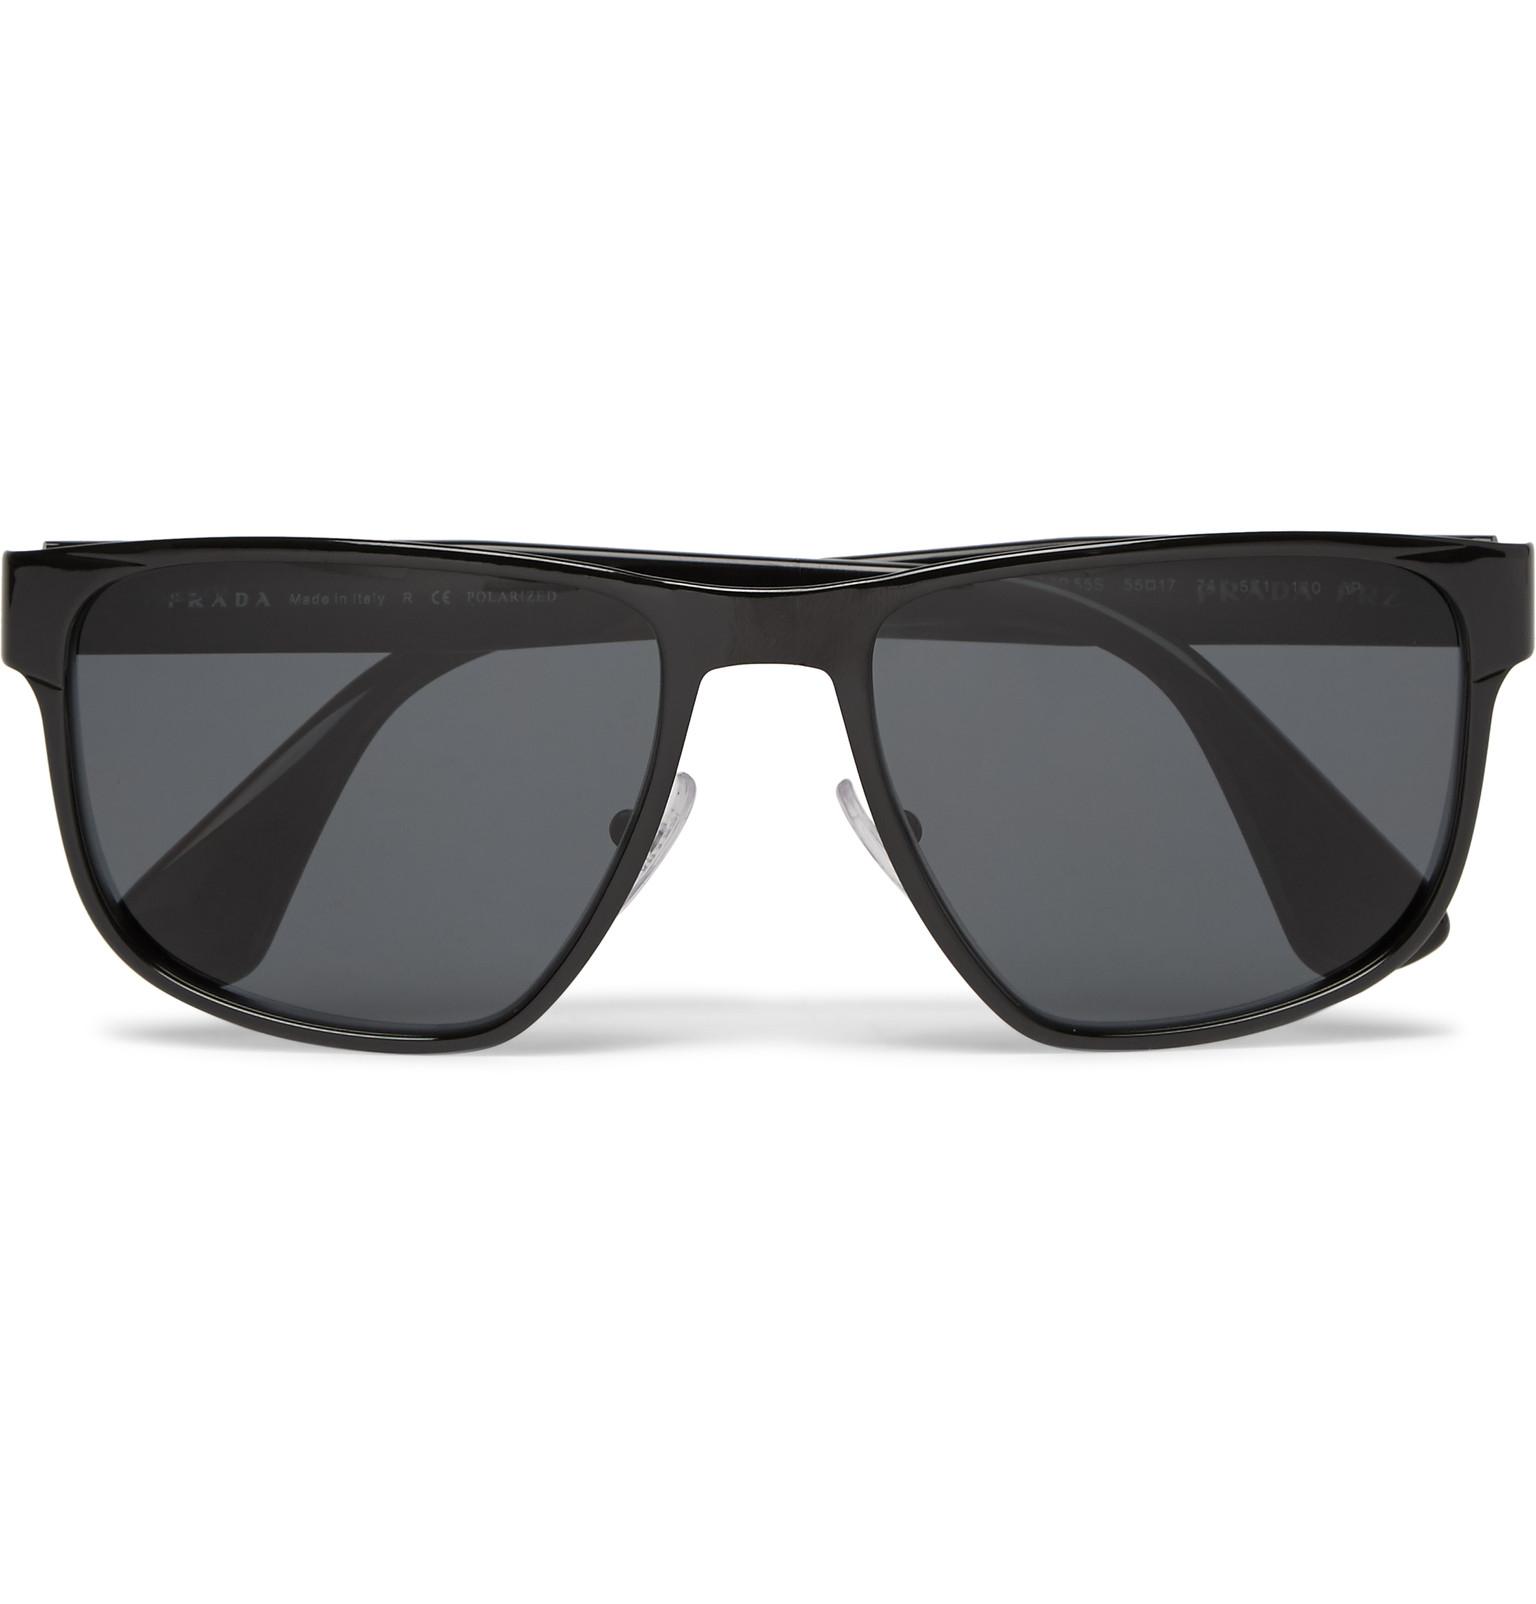 33cbf9c9e2c Lyst - Prada Square-frame Metal And Tortoiseshell Acetate Sunglasses in  Black for Men